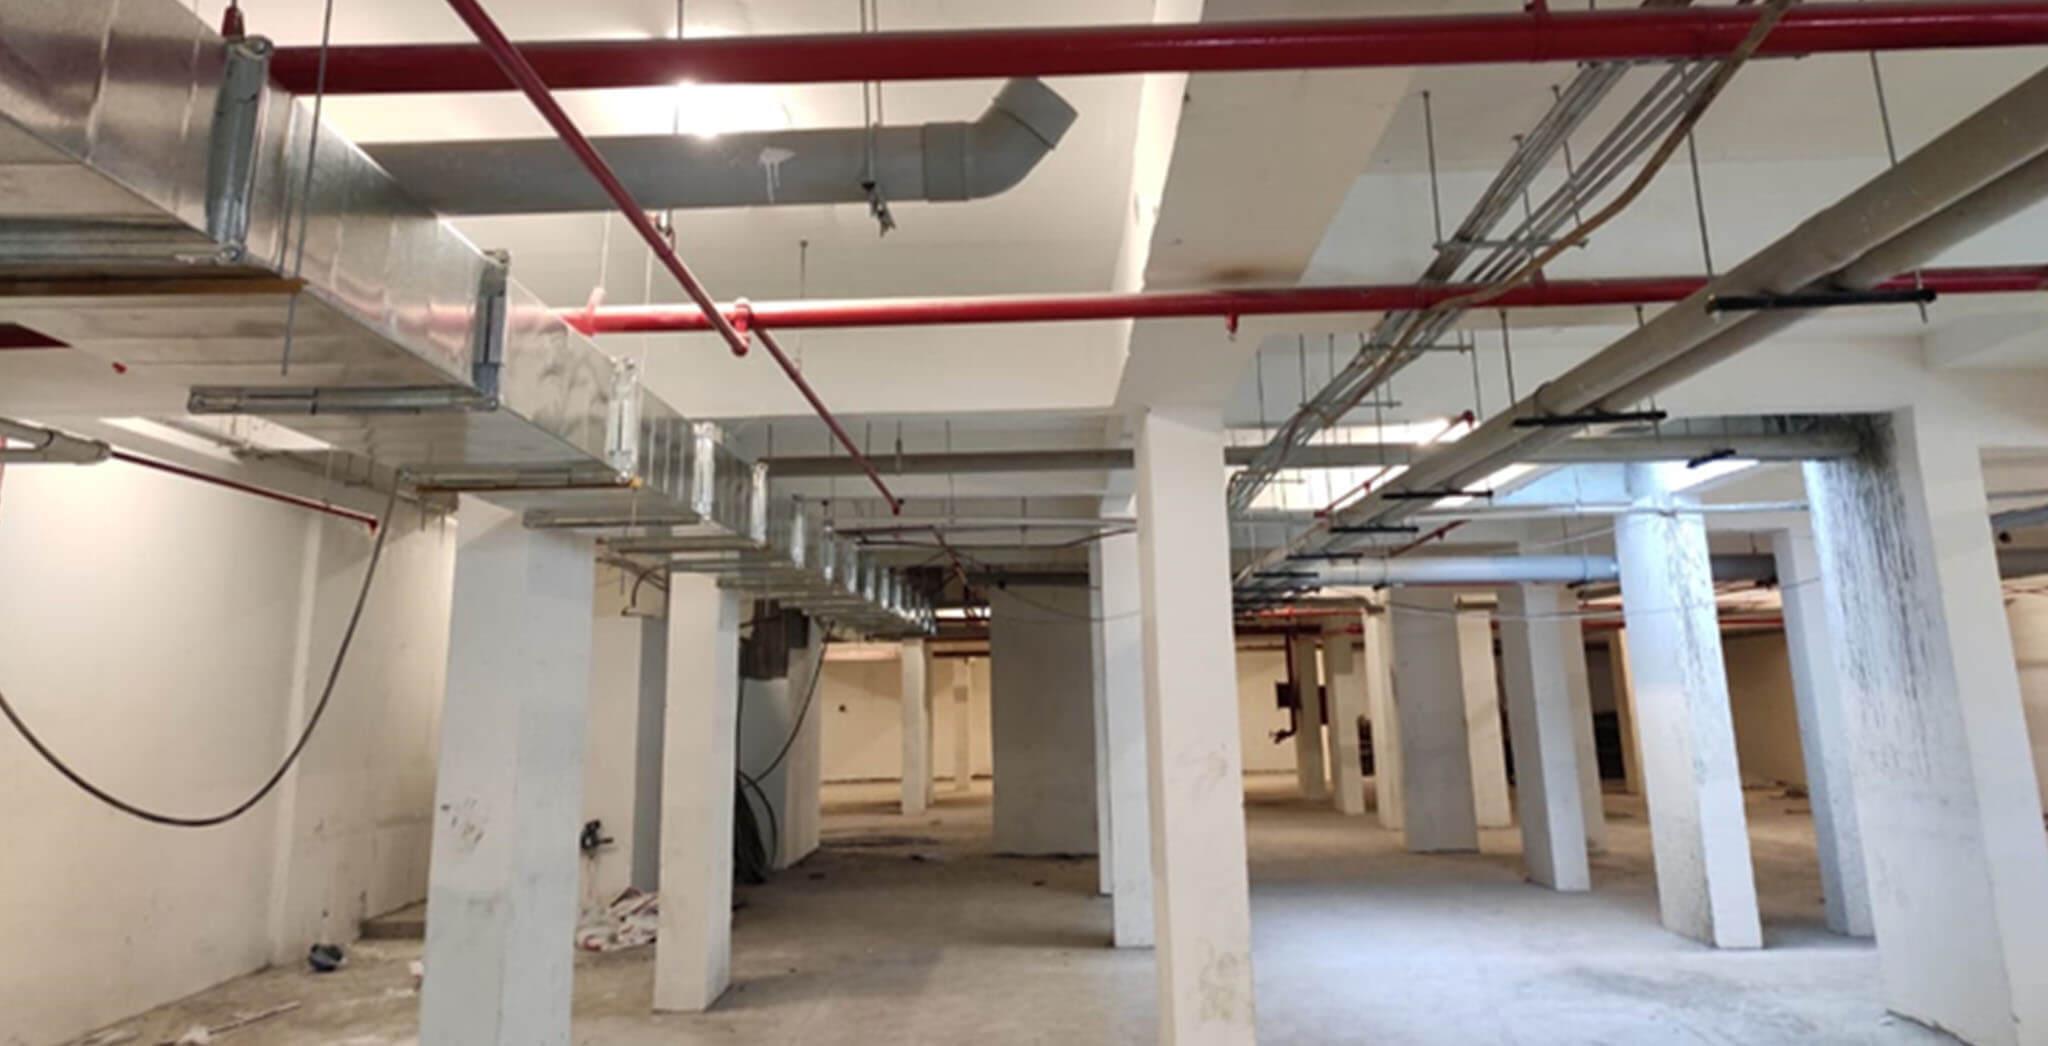 Feb 2021 - Basement VDF & MEP works completed